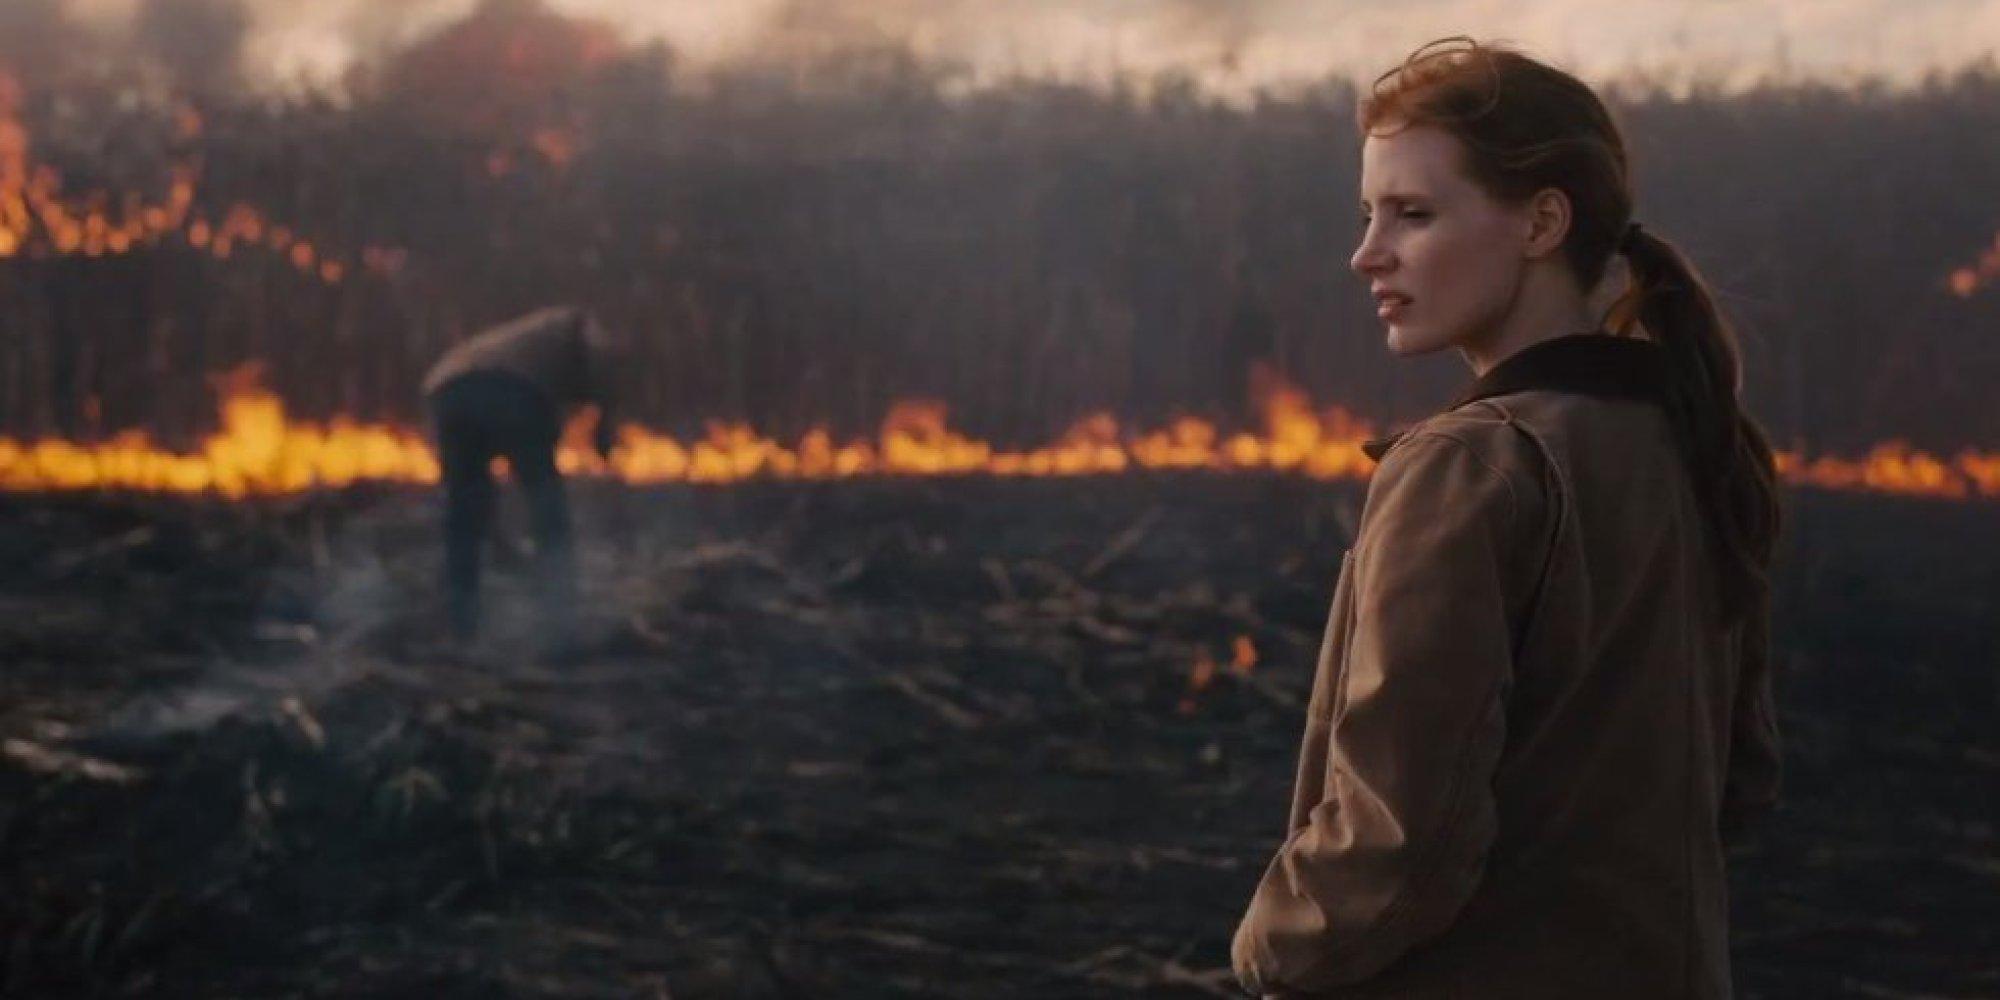 Jessica Chastain's Secret 'Interstellar' Role Revealed ...